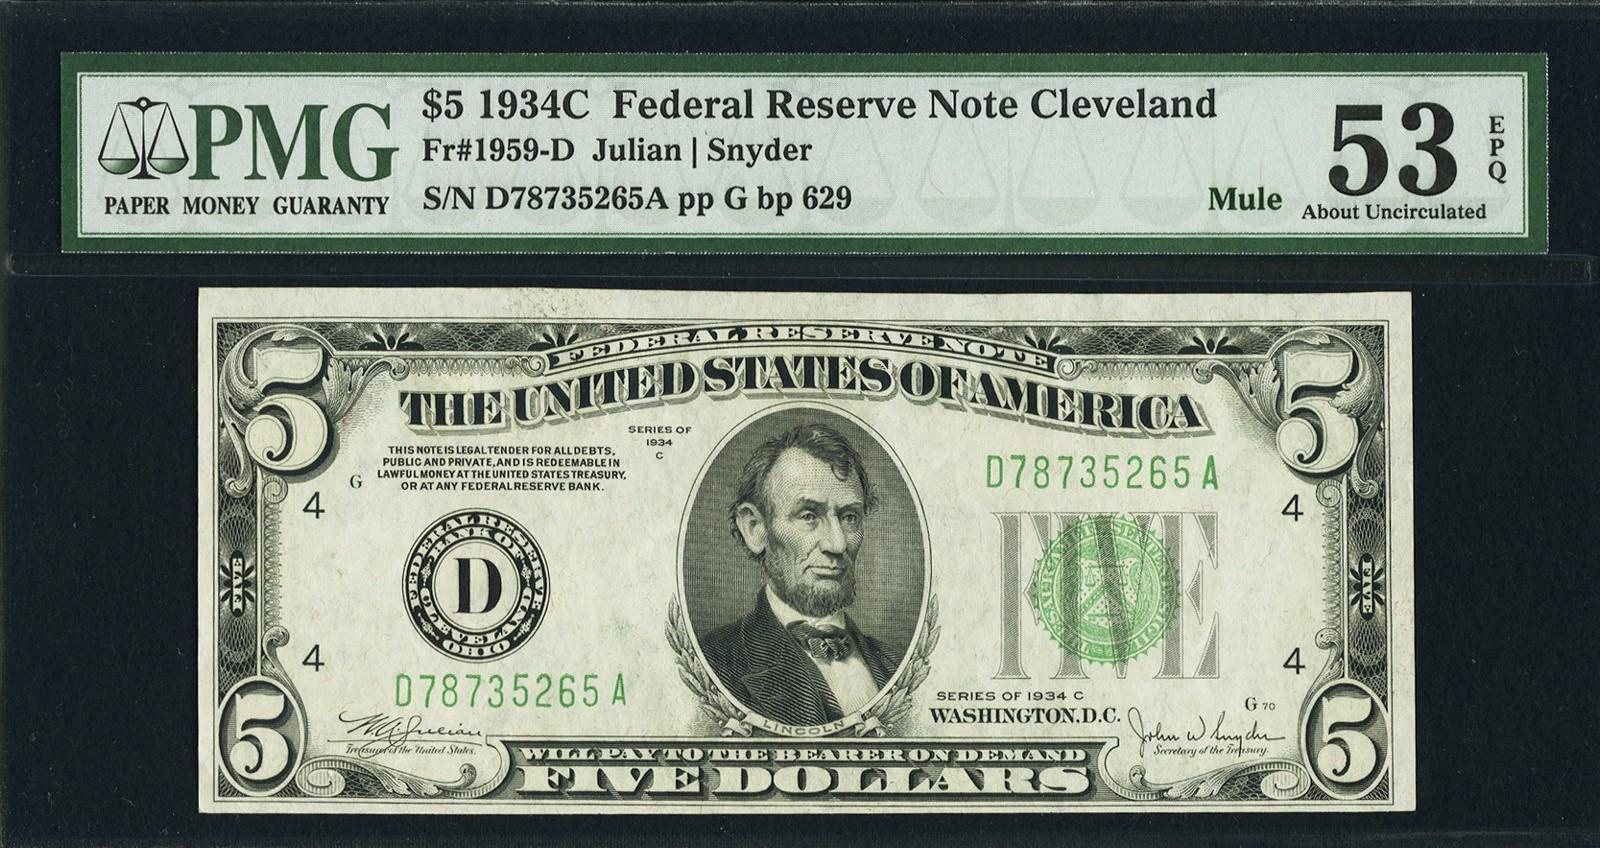 1934C Cleveland 629 lfb.jpg